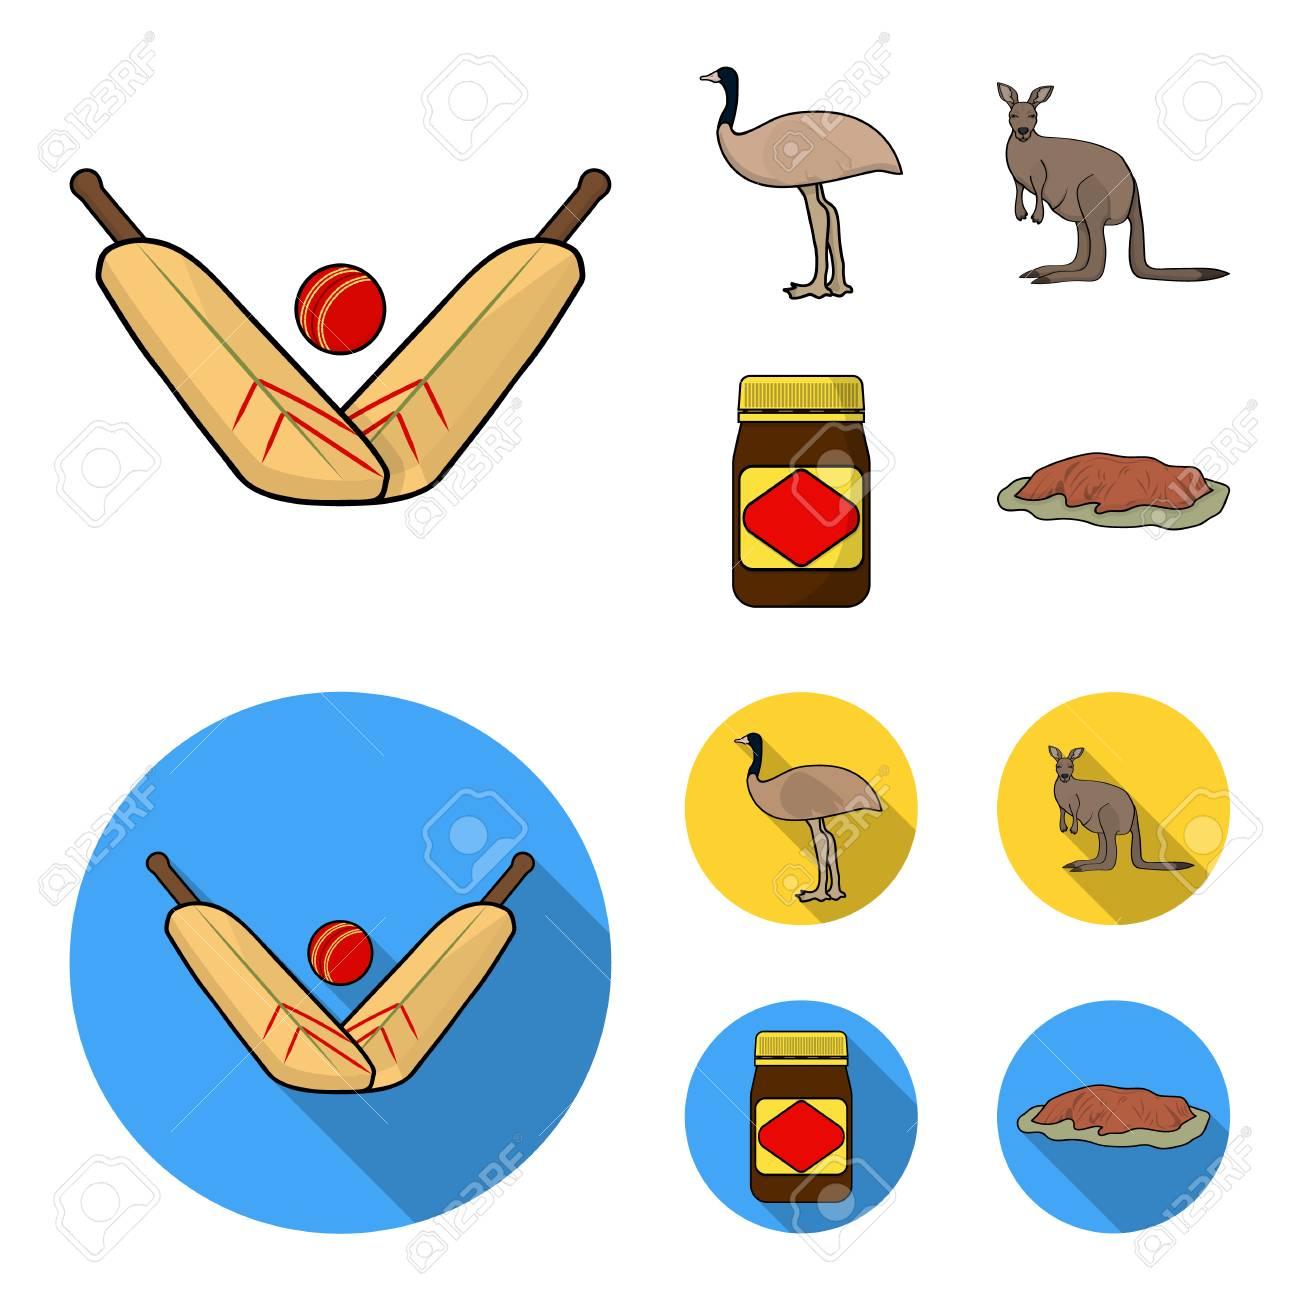 a game of cricket an emu ostrich a kangaroo a popular food rh 123rf com Cartoon Crickets Insect Funny Cricket Cartoons